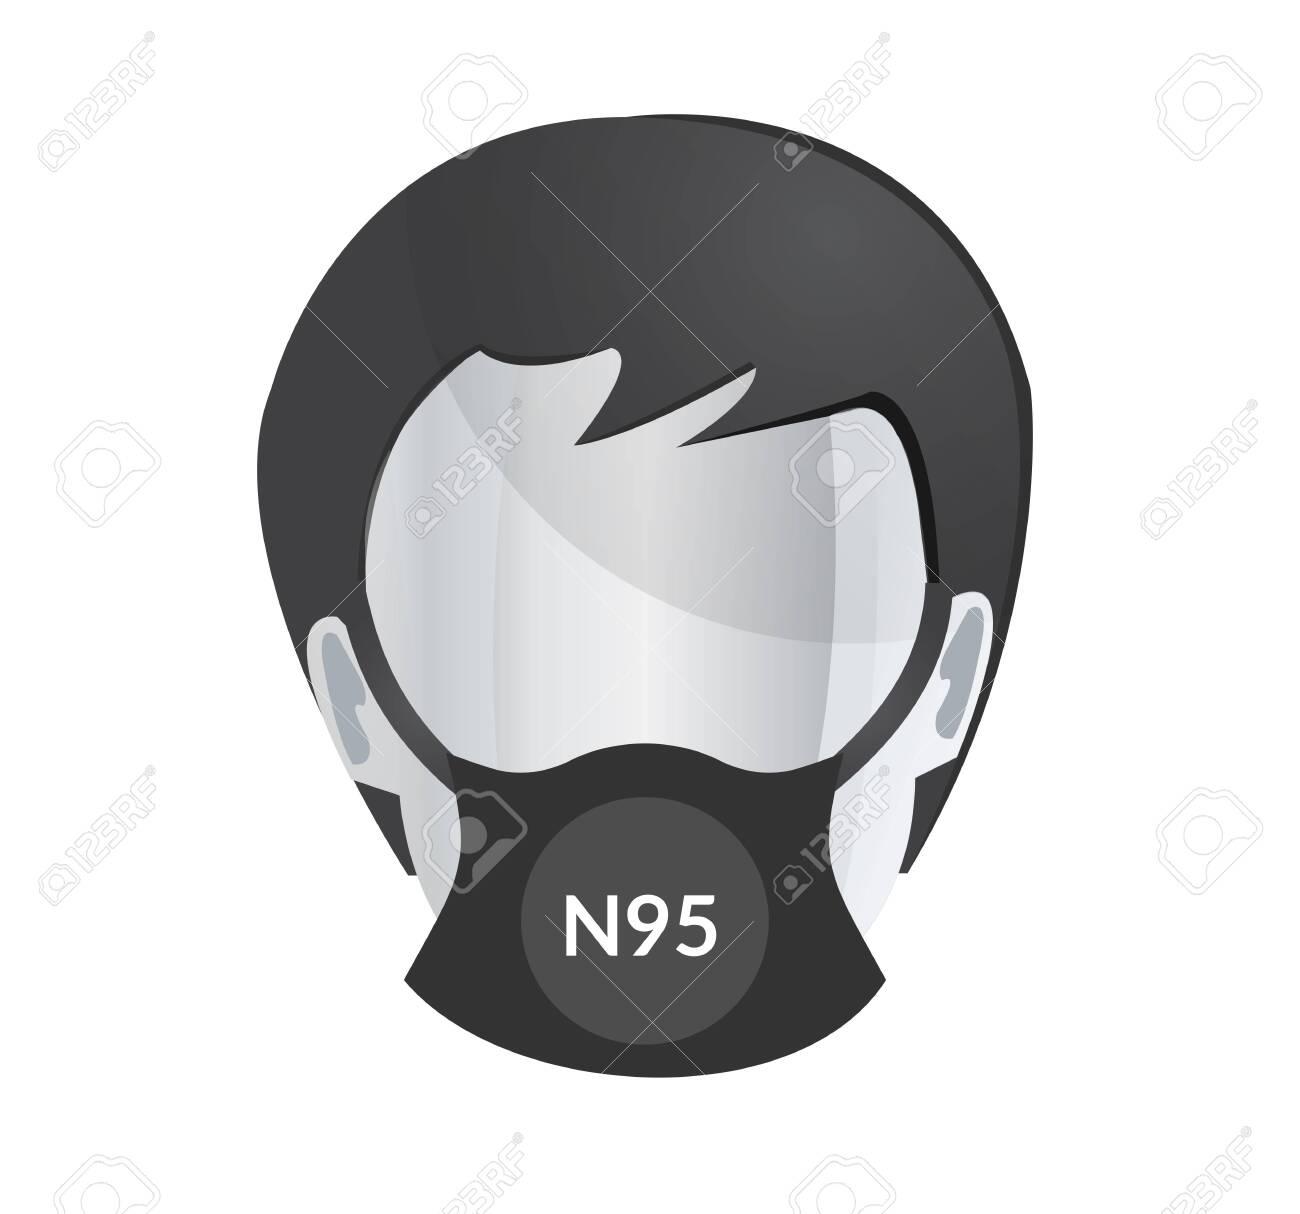 protective mask n95